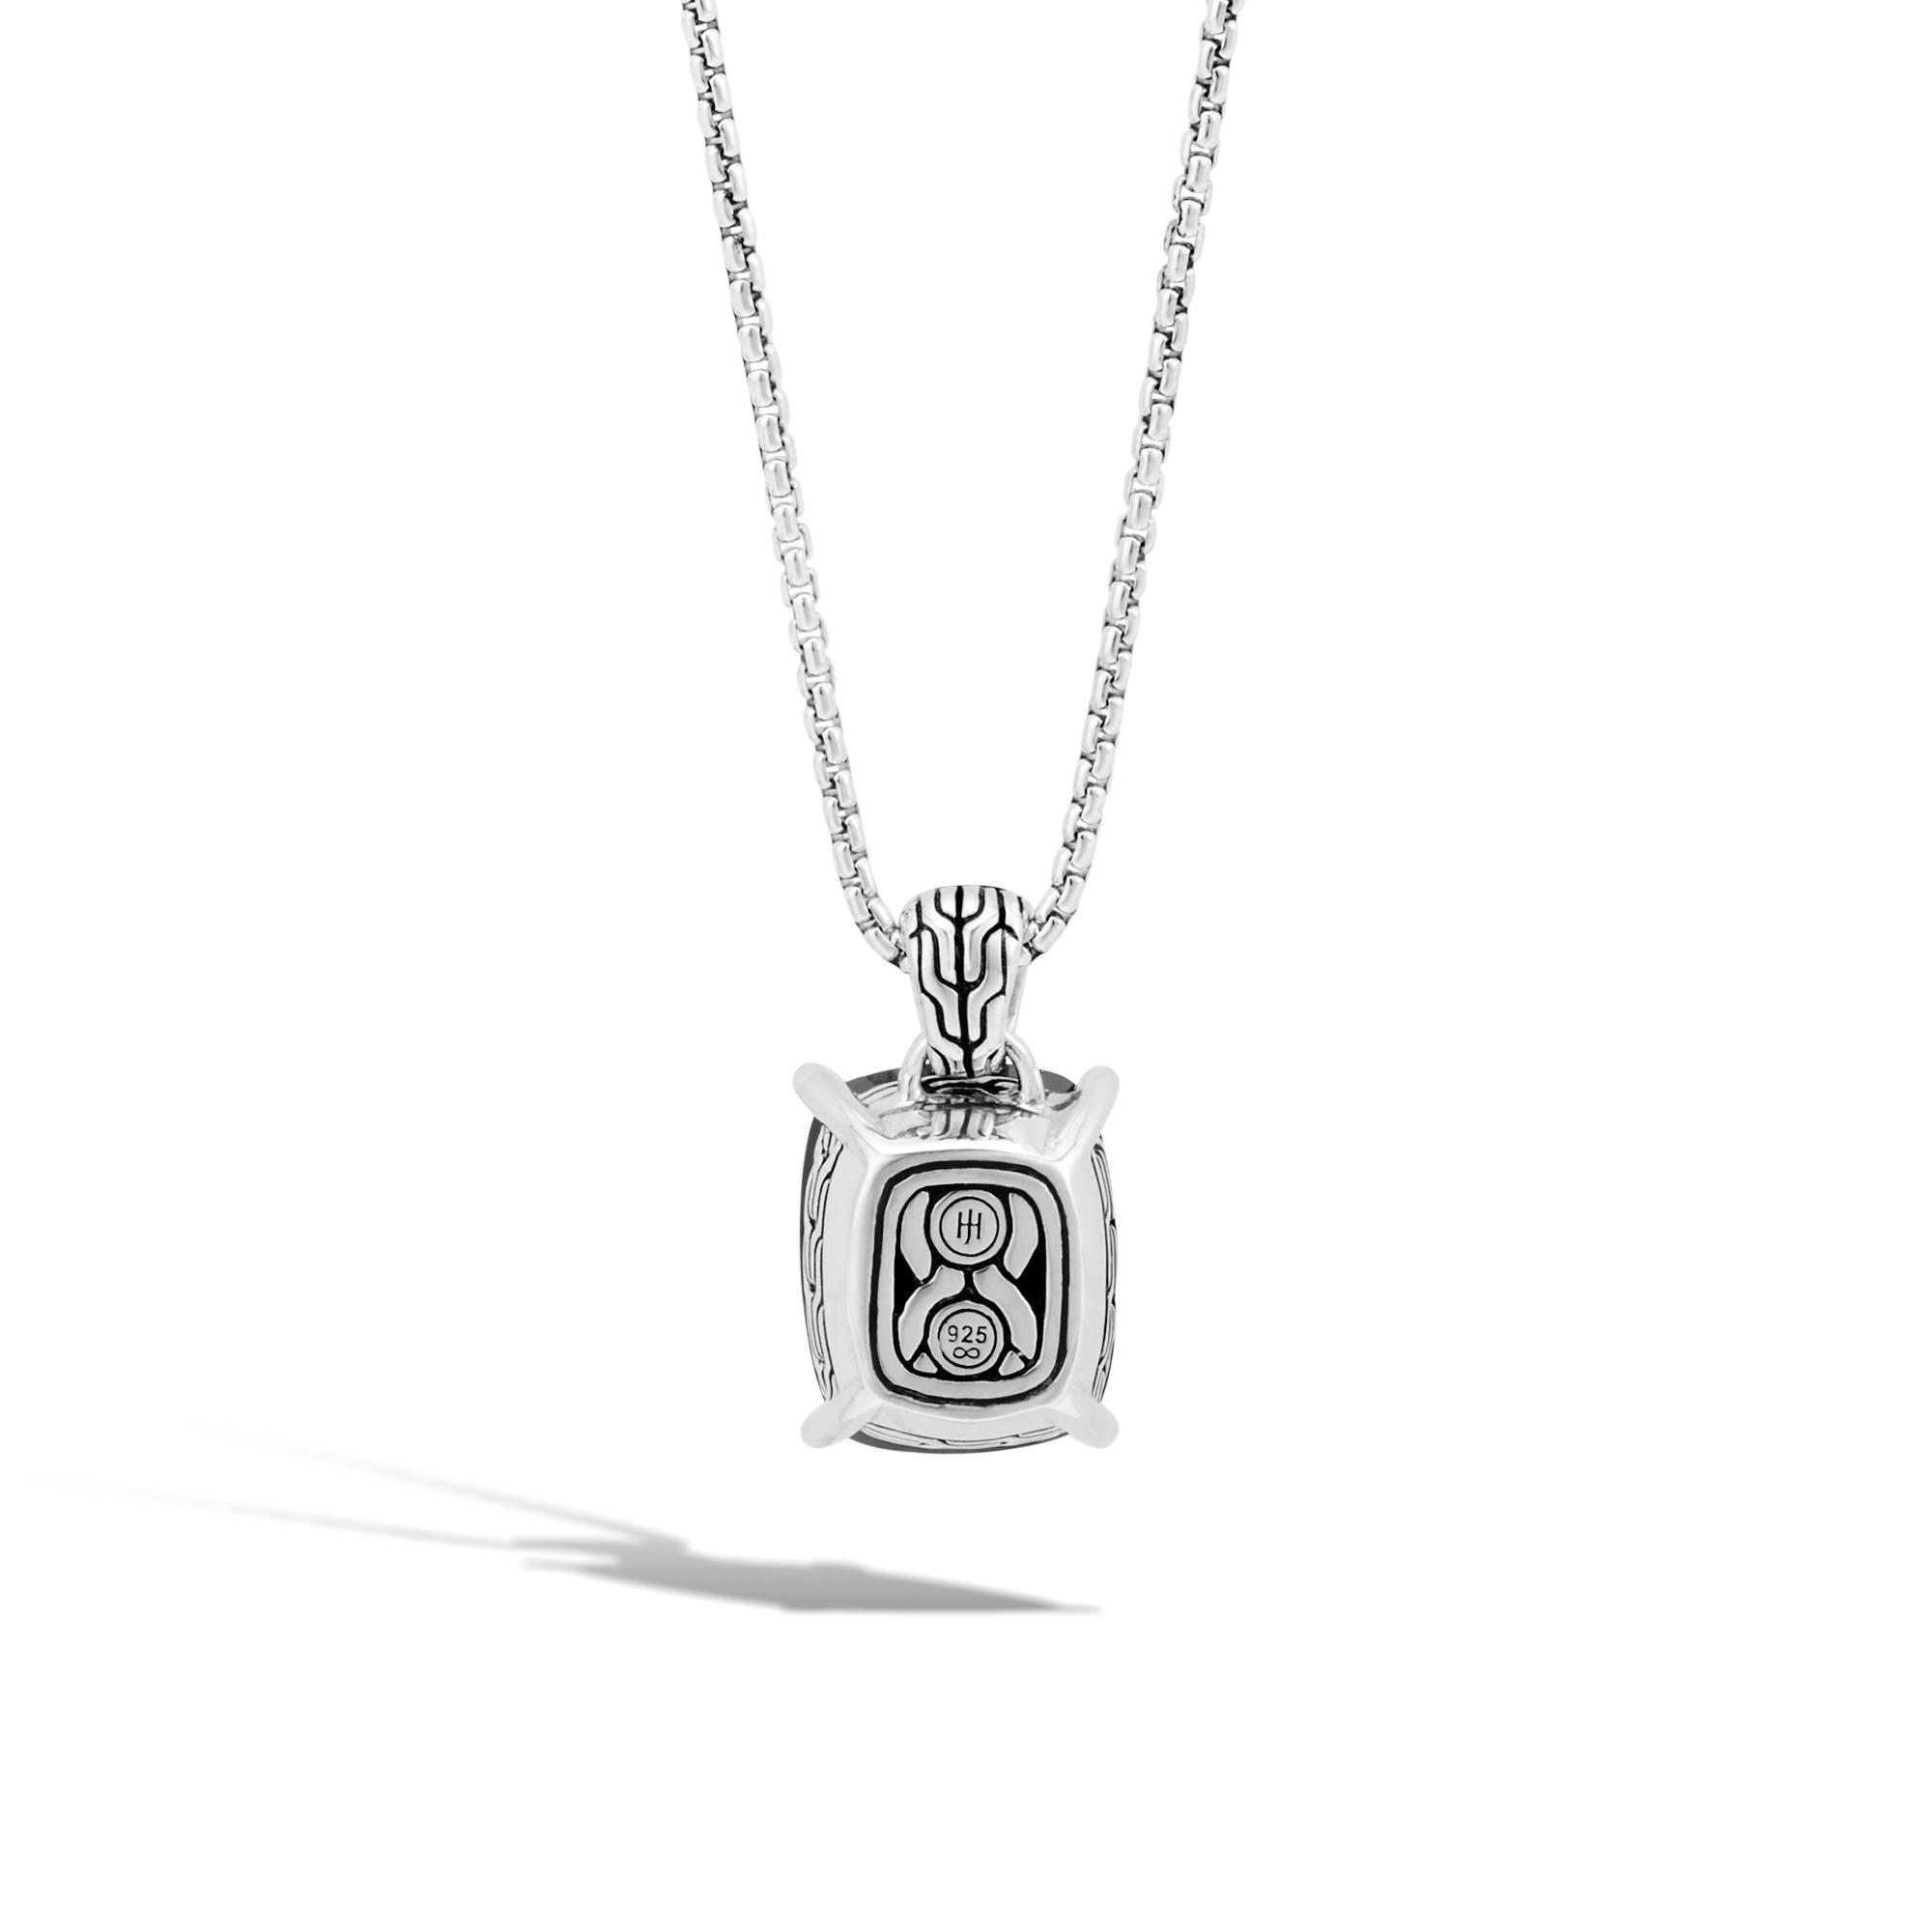 Classic Chain Magic Cut Pendant, Silver, Gemstone, Diamonds, Black Onyx, large